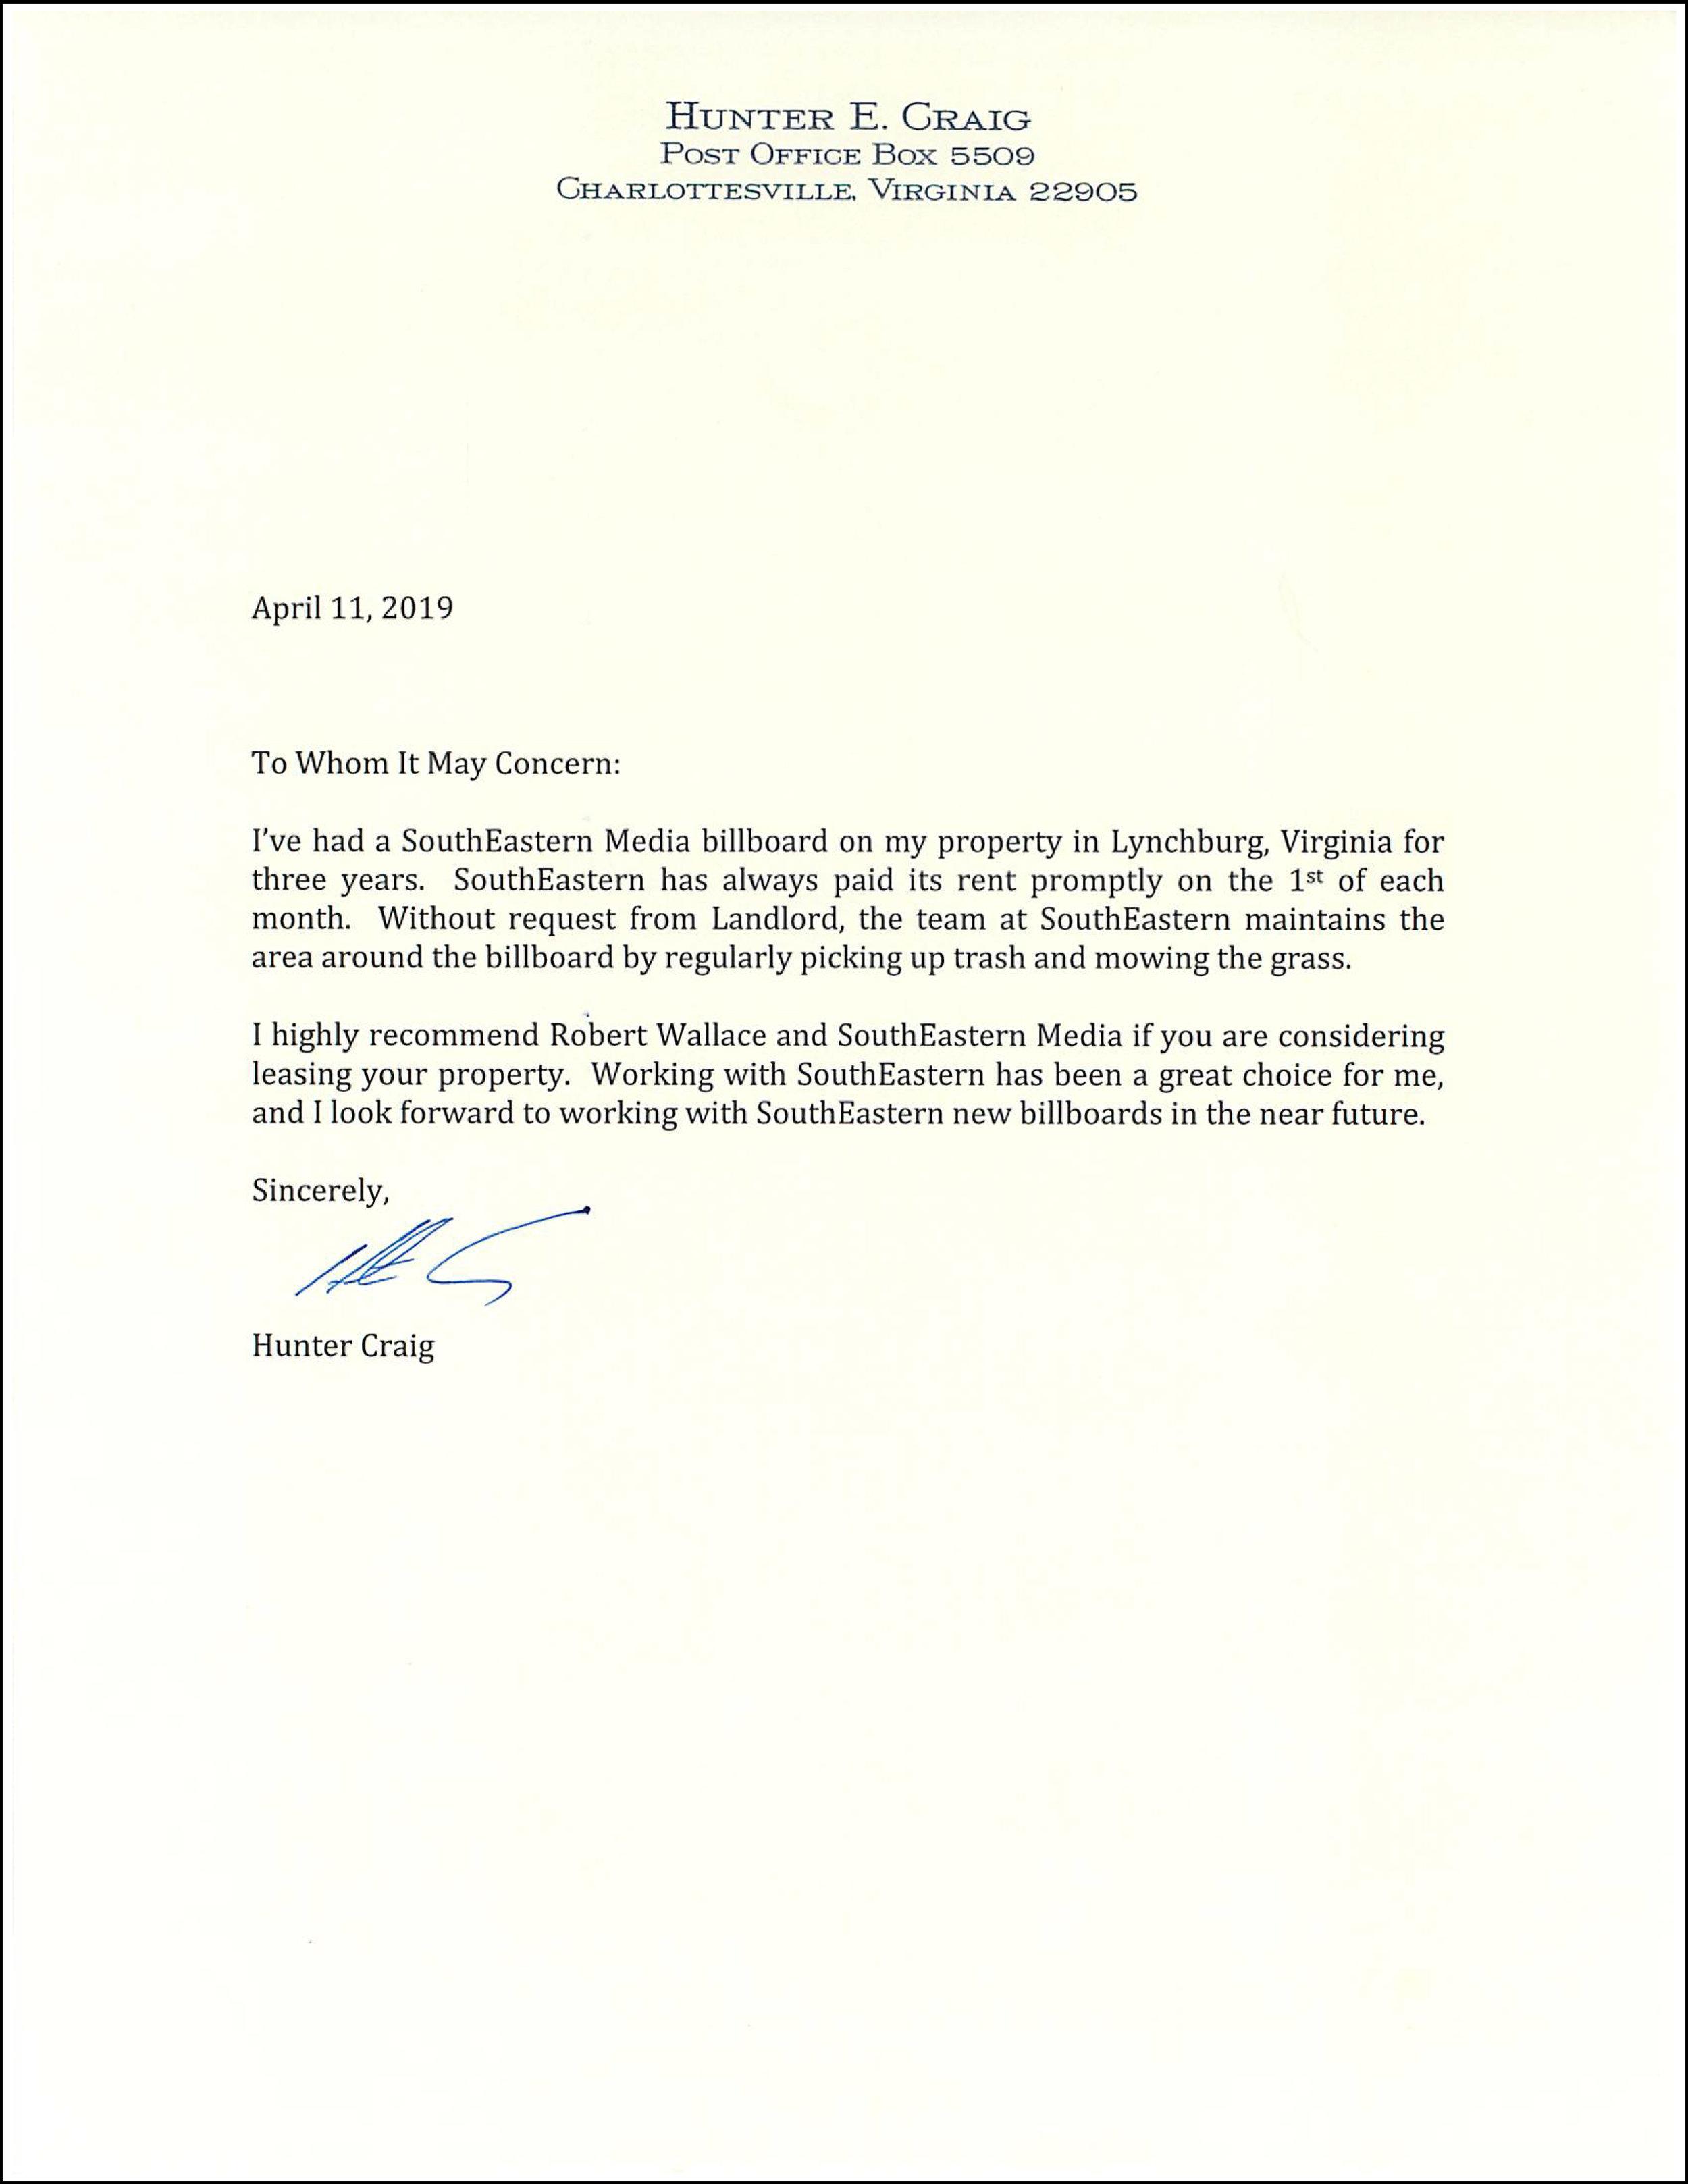 Recomendation Letter 2.jpg